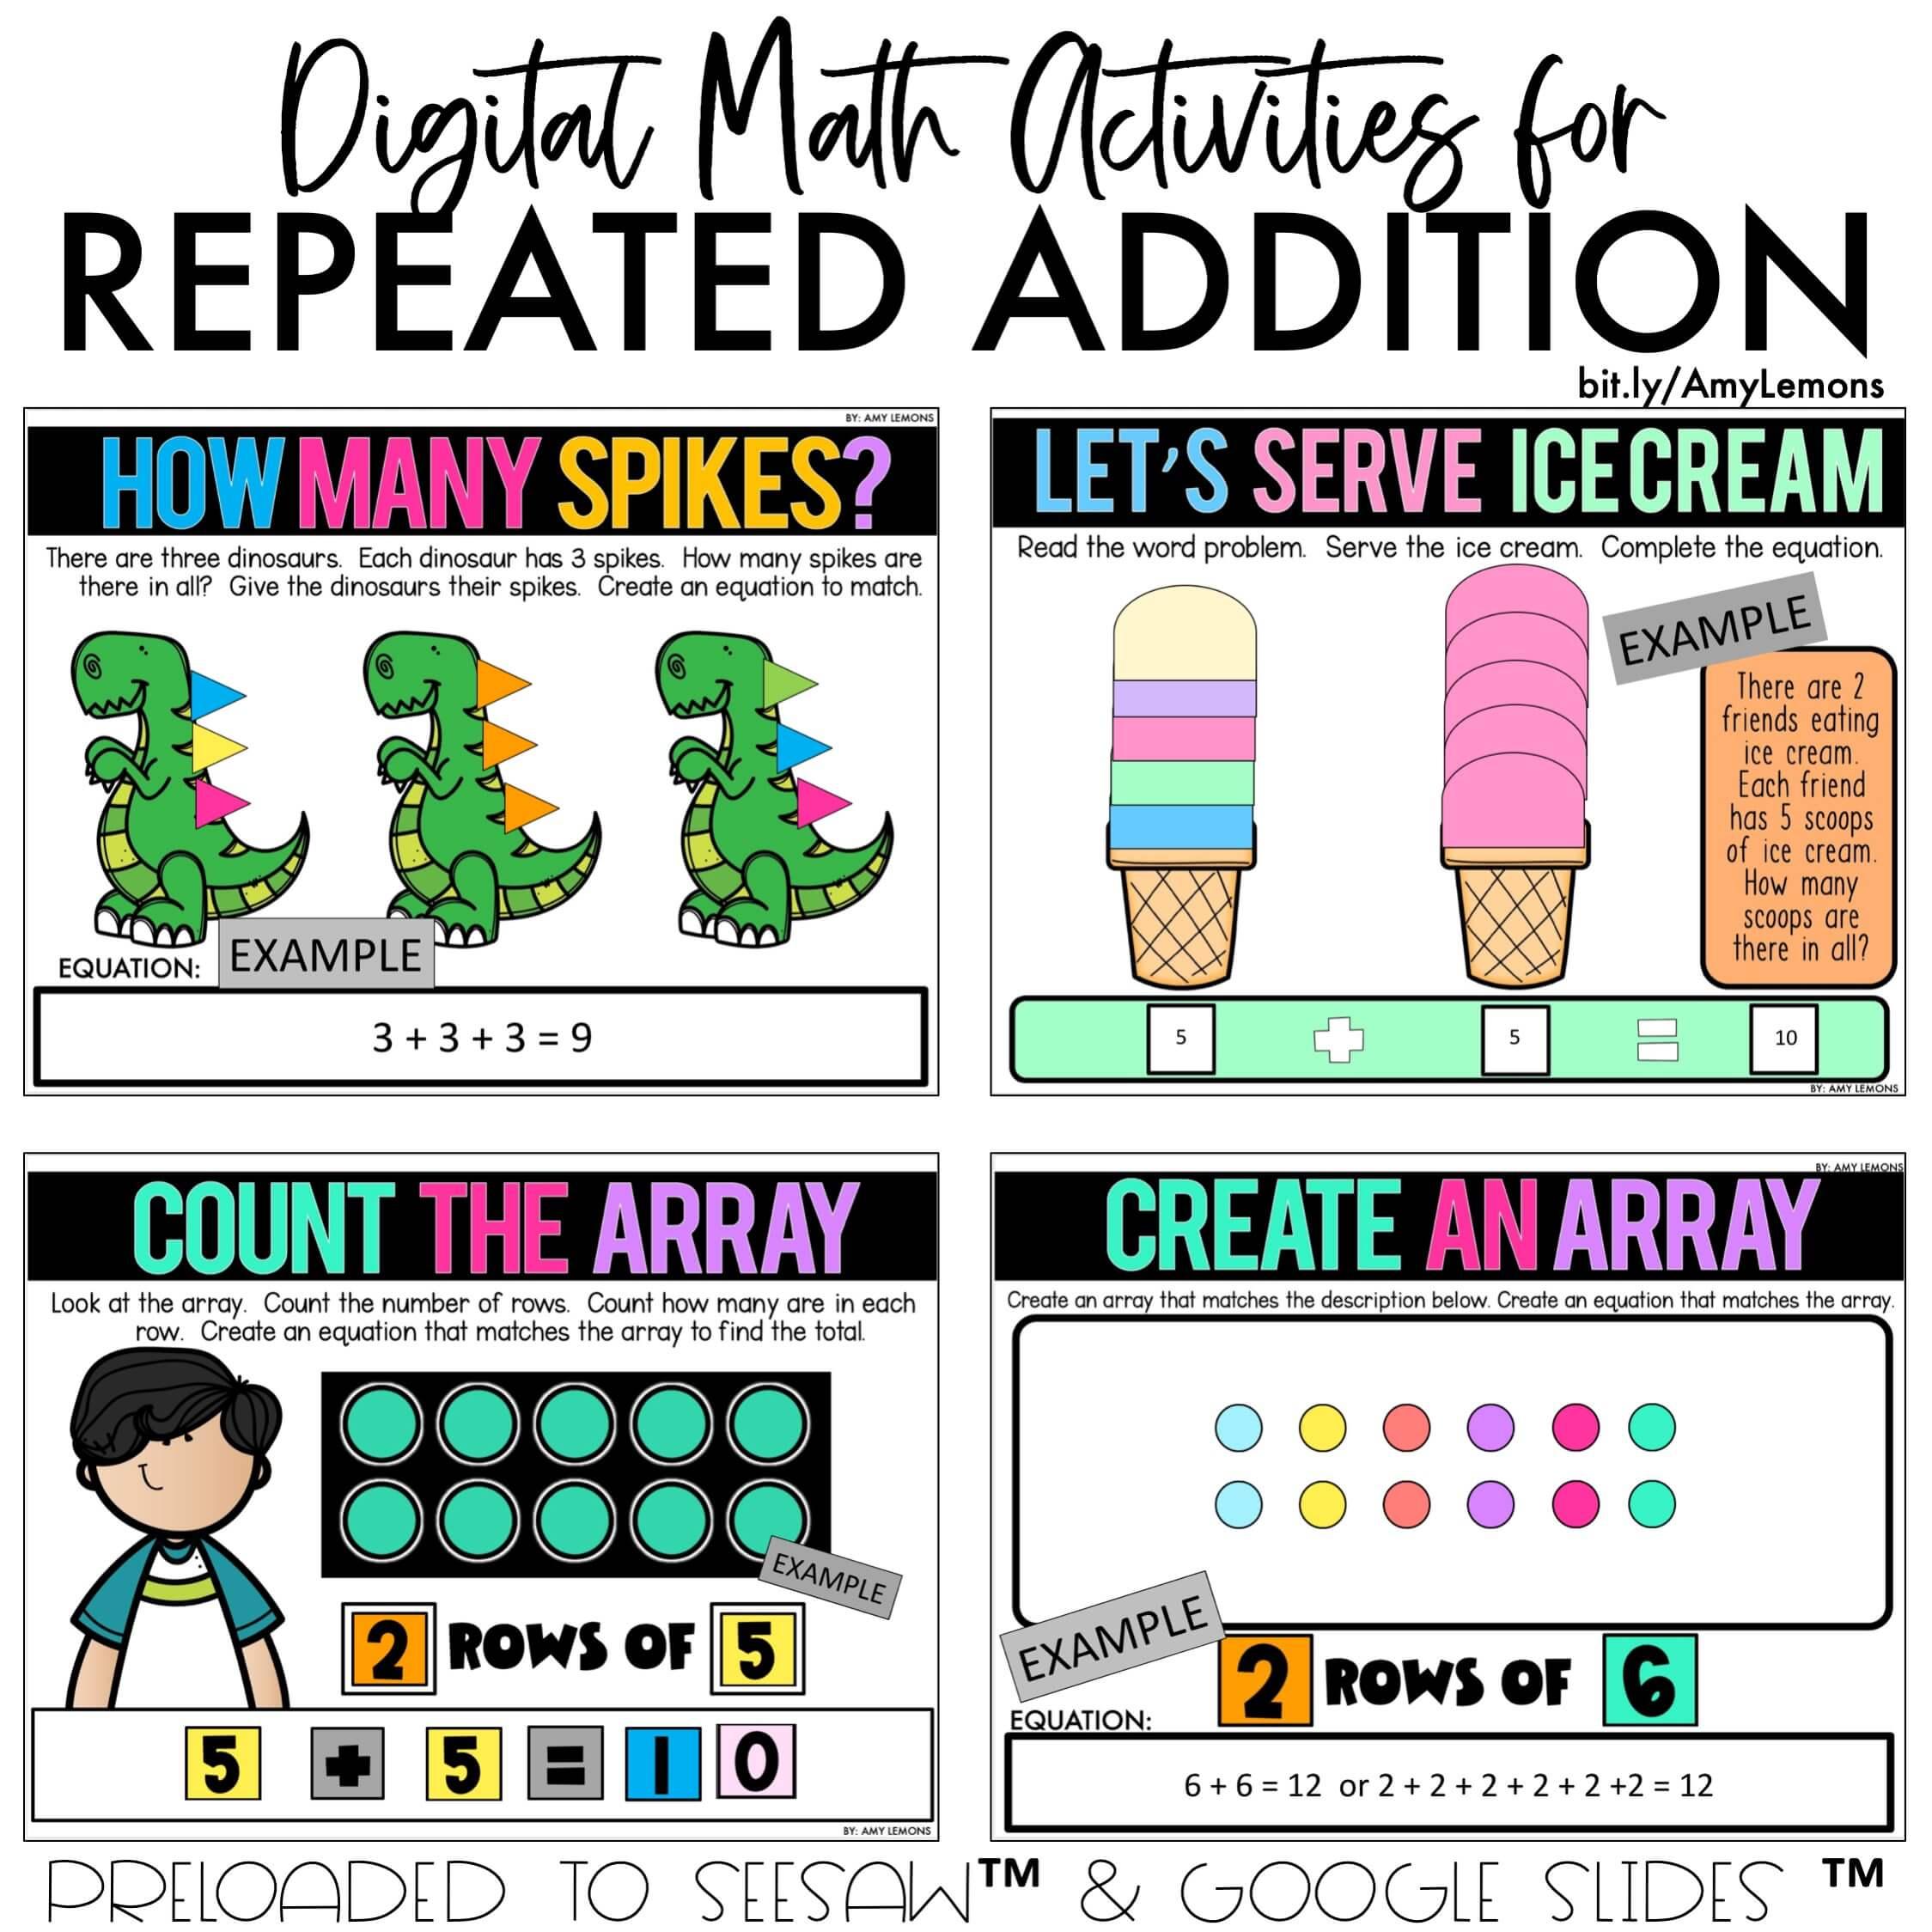 medium resolution of Digital Math Activities for Virtual Learning - Amy Lemons